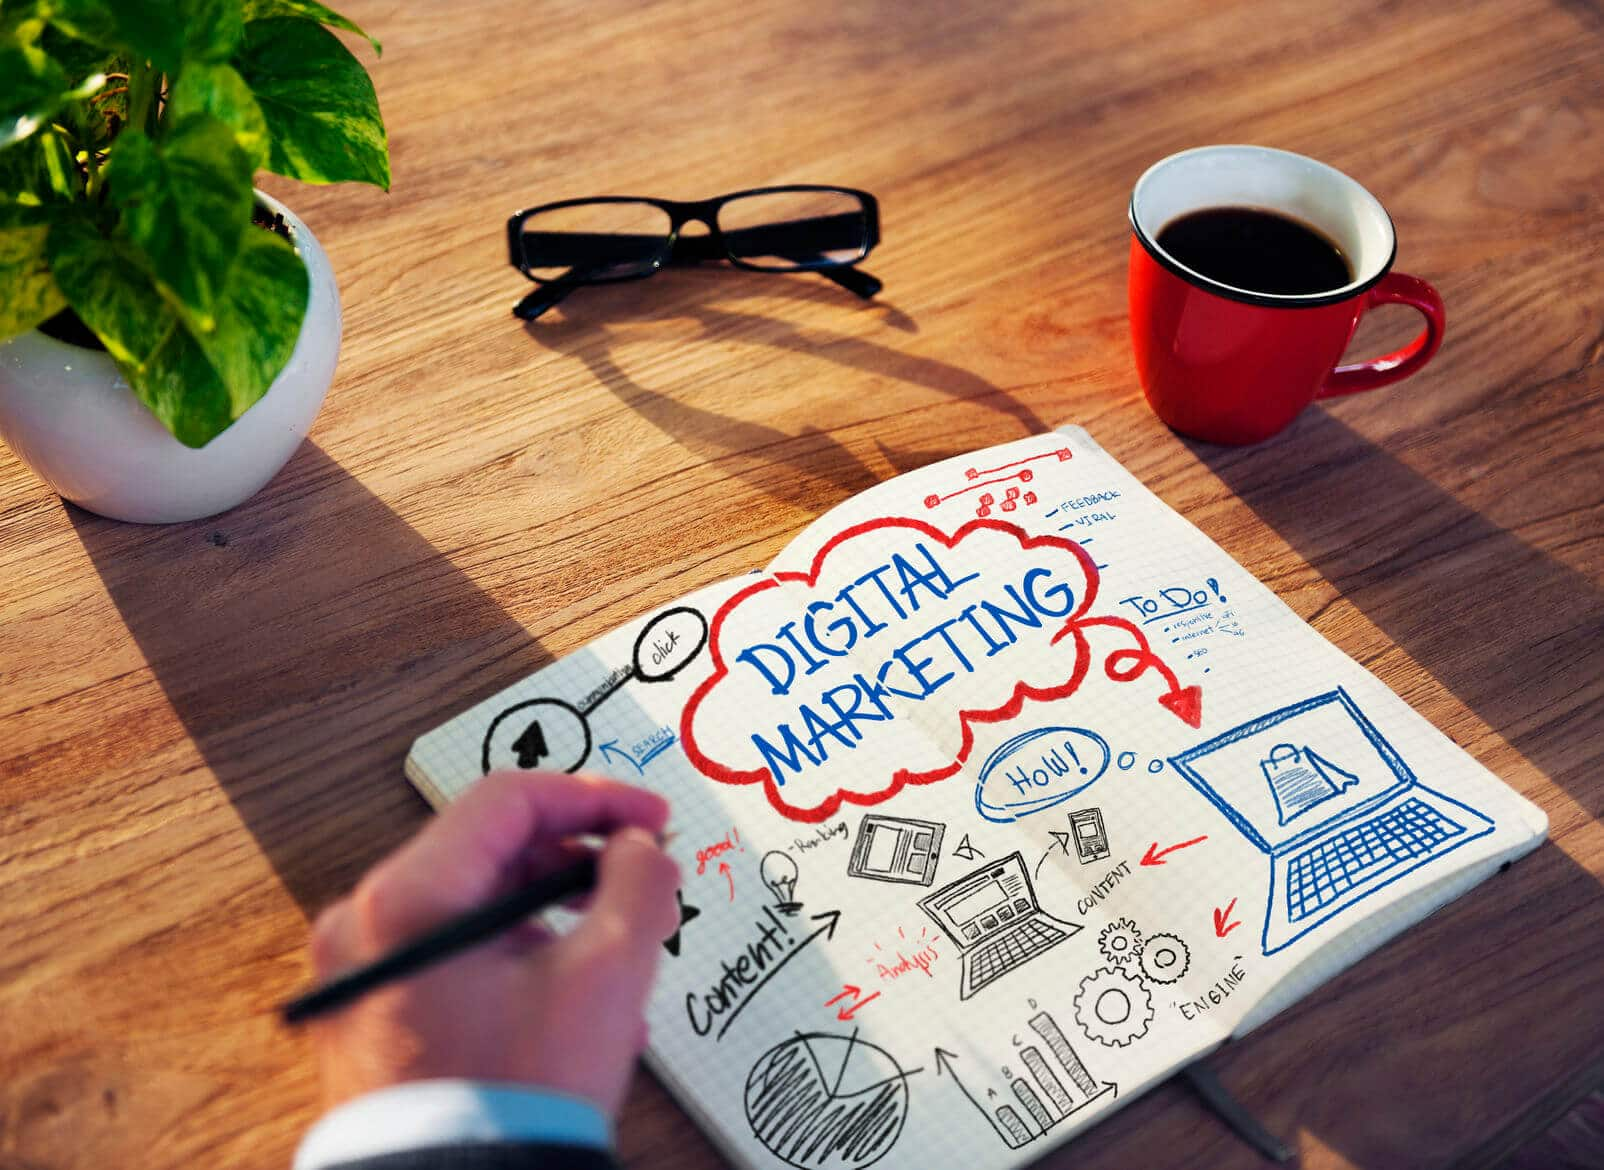 29 Reasons Digital Marketing Belongs in Your Public Relations Strategy